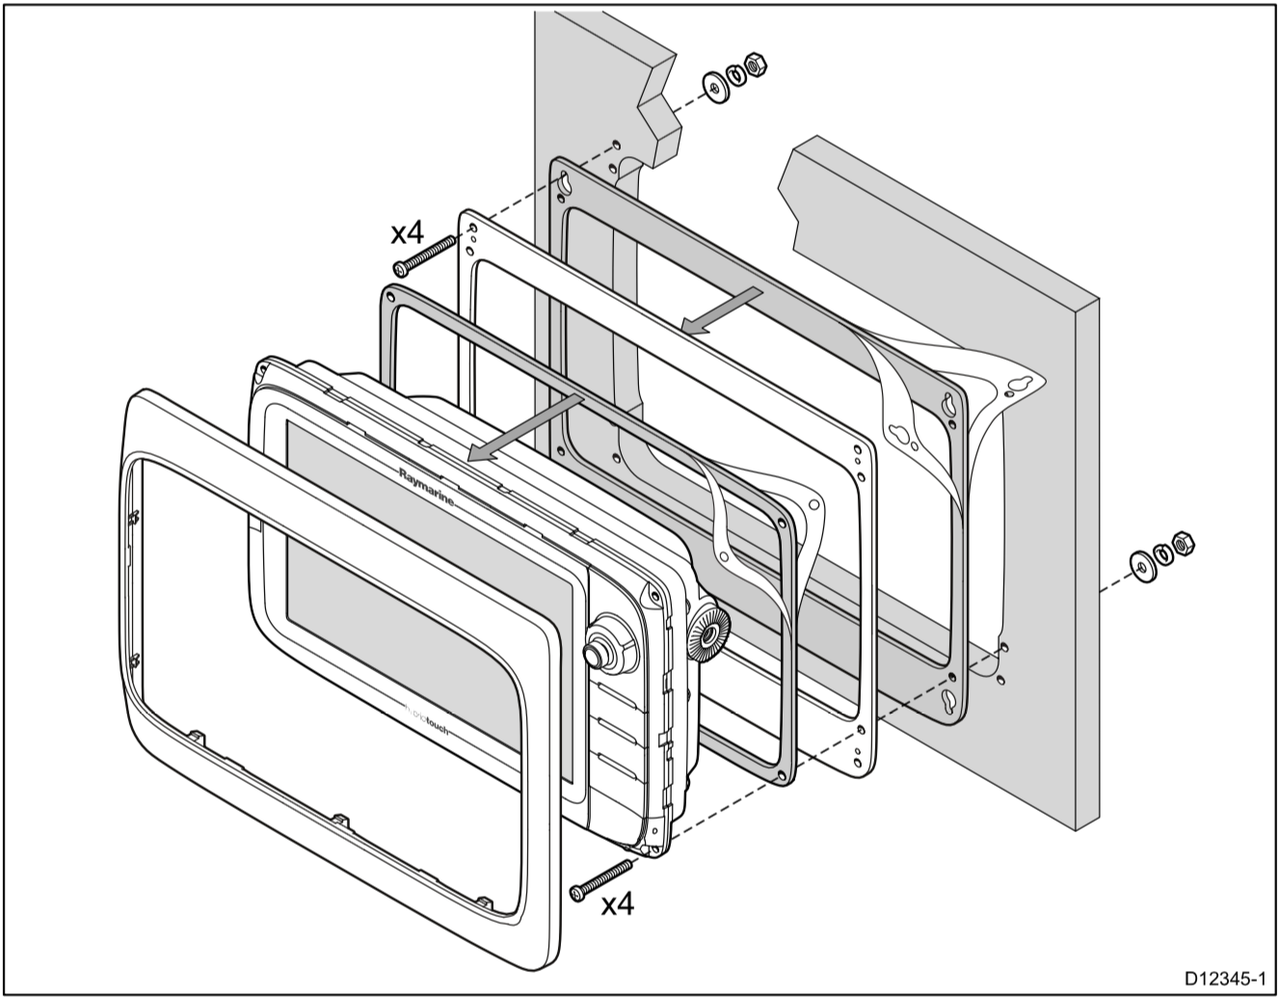 Garmin 441s Wiring Diagram | Wiring Liry on